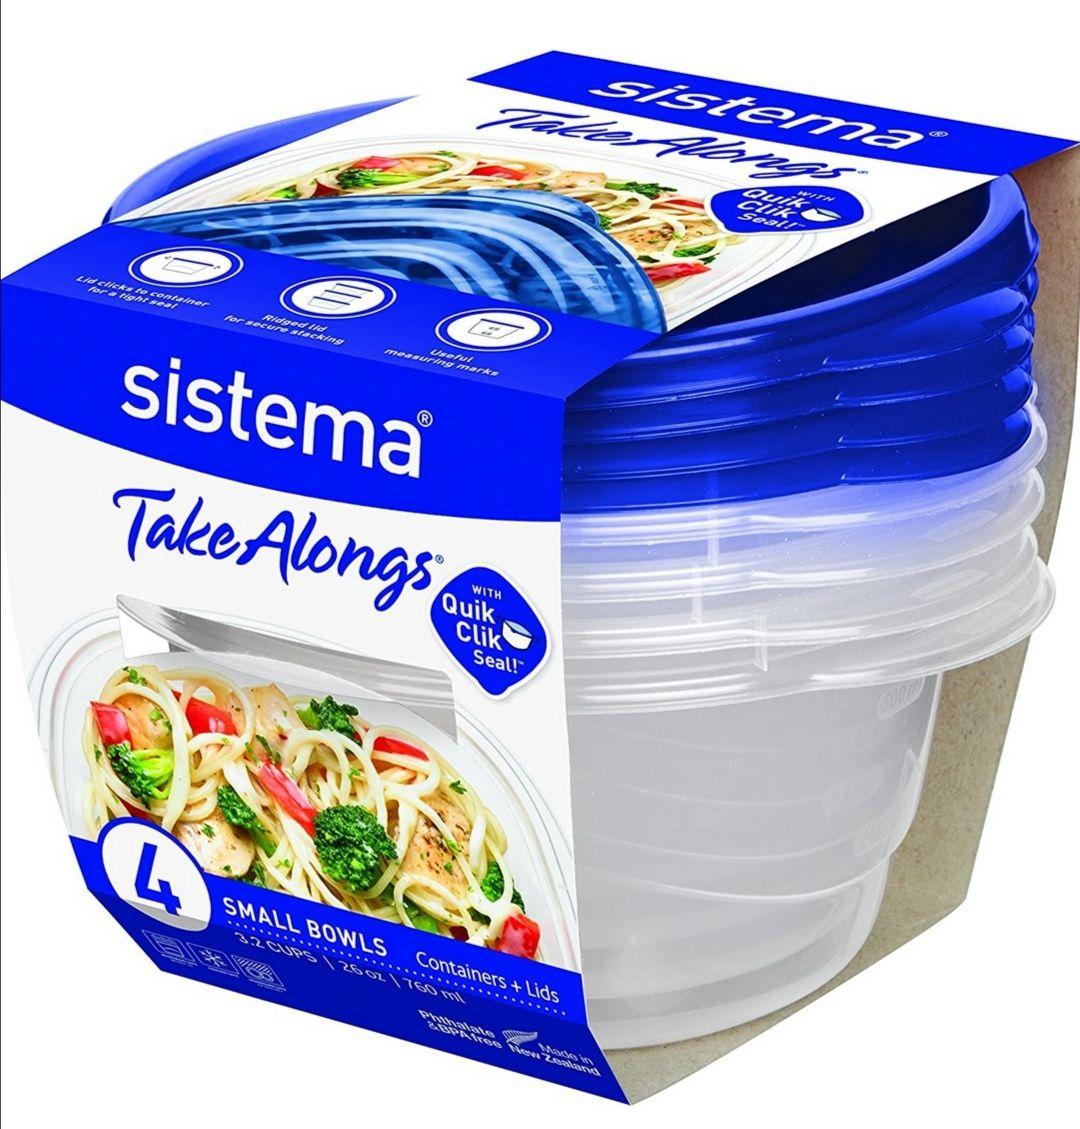 Sistema Takealongs 760ml Small Bowl 4 Pack Food Storage Containers - £2.20 Prime / +£4.49 Non Prime @ Amazon